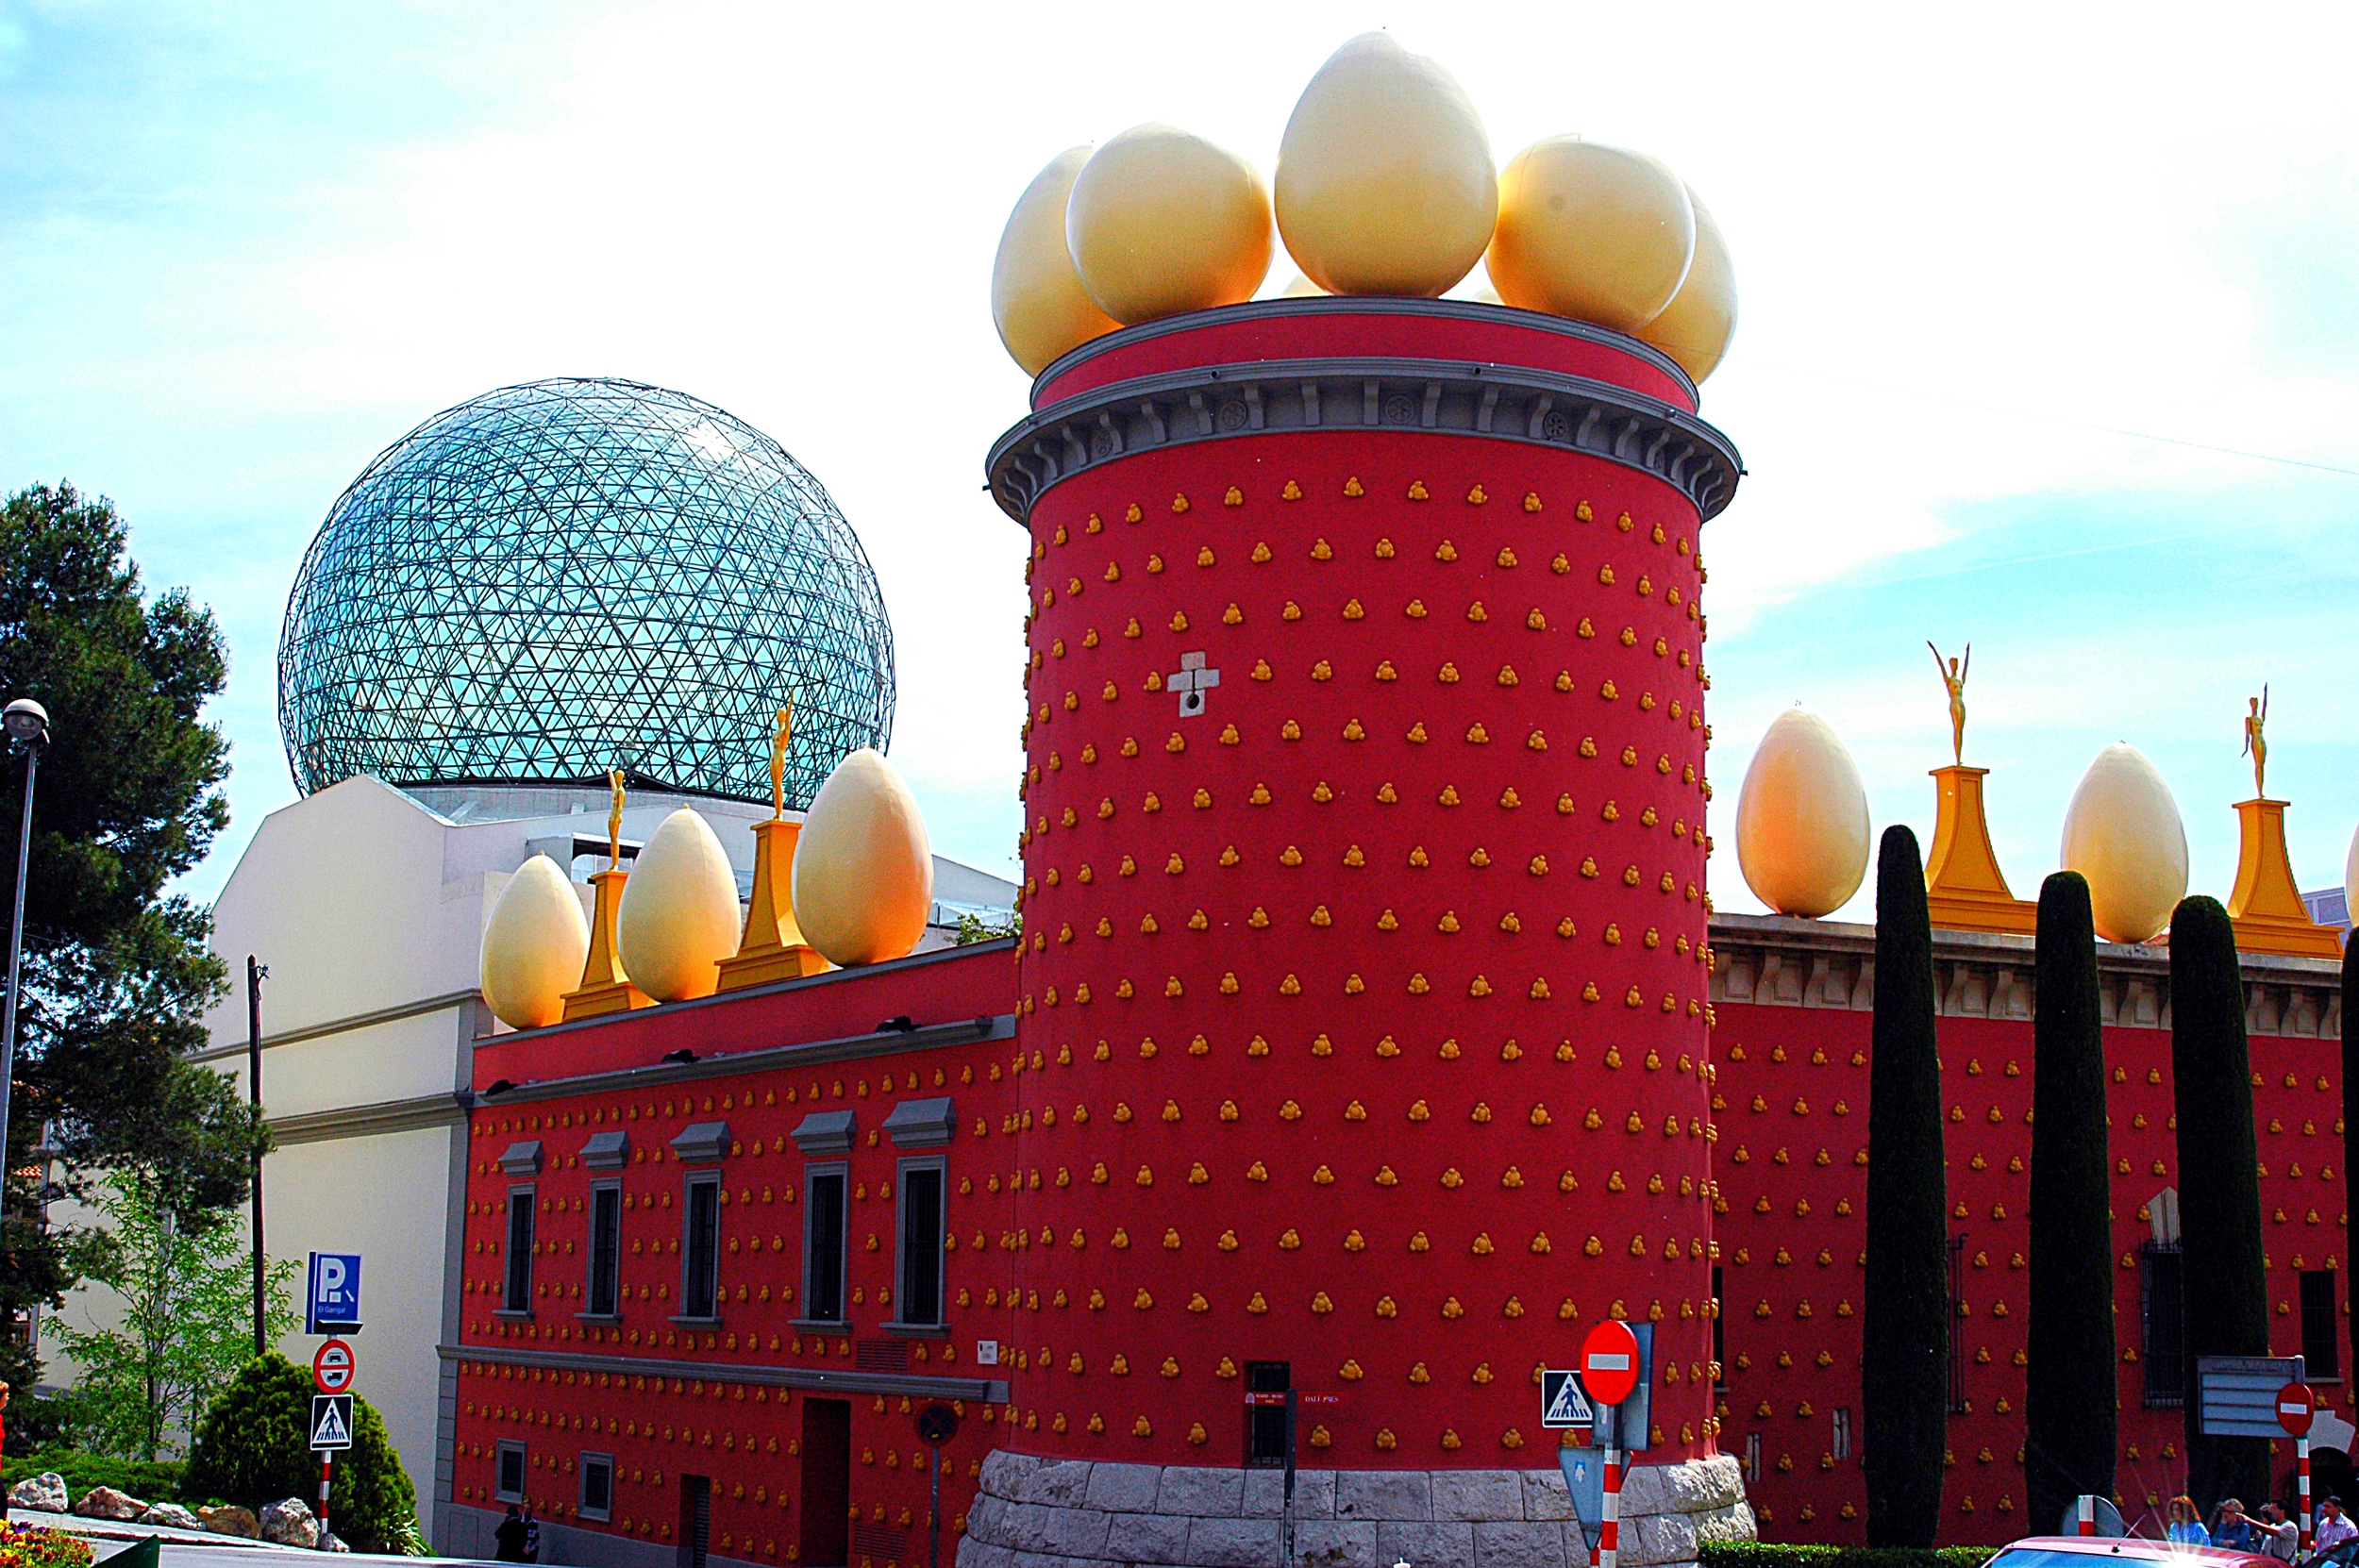 117_Figueres,_torre_Galatea_i_cúpula_del_Museu_Dalí.JPG